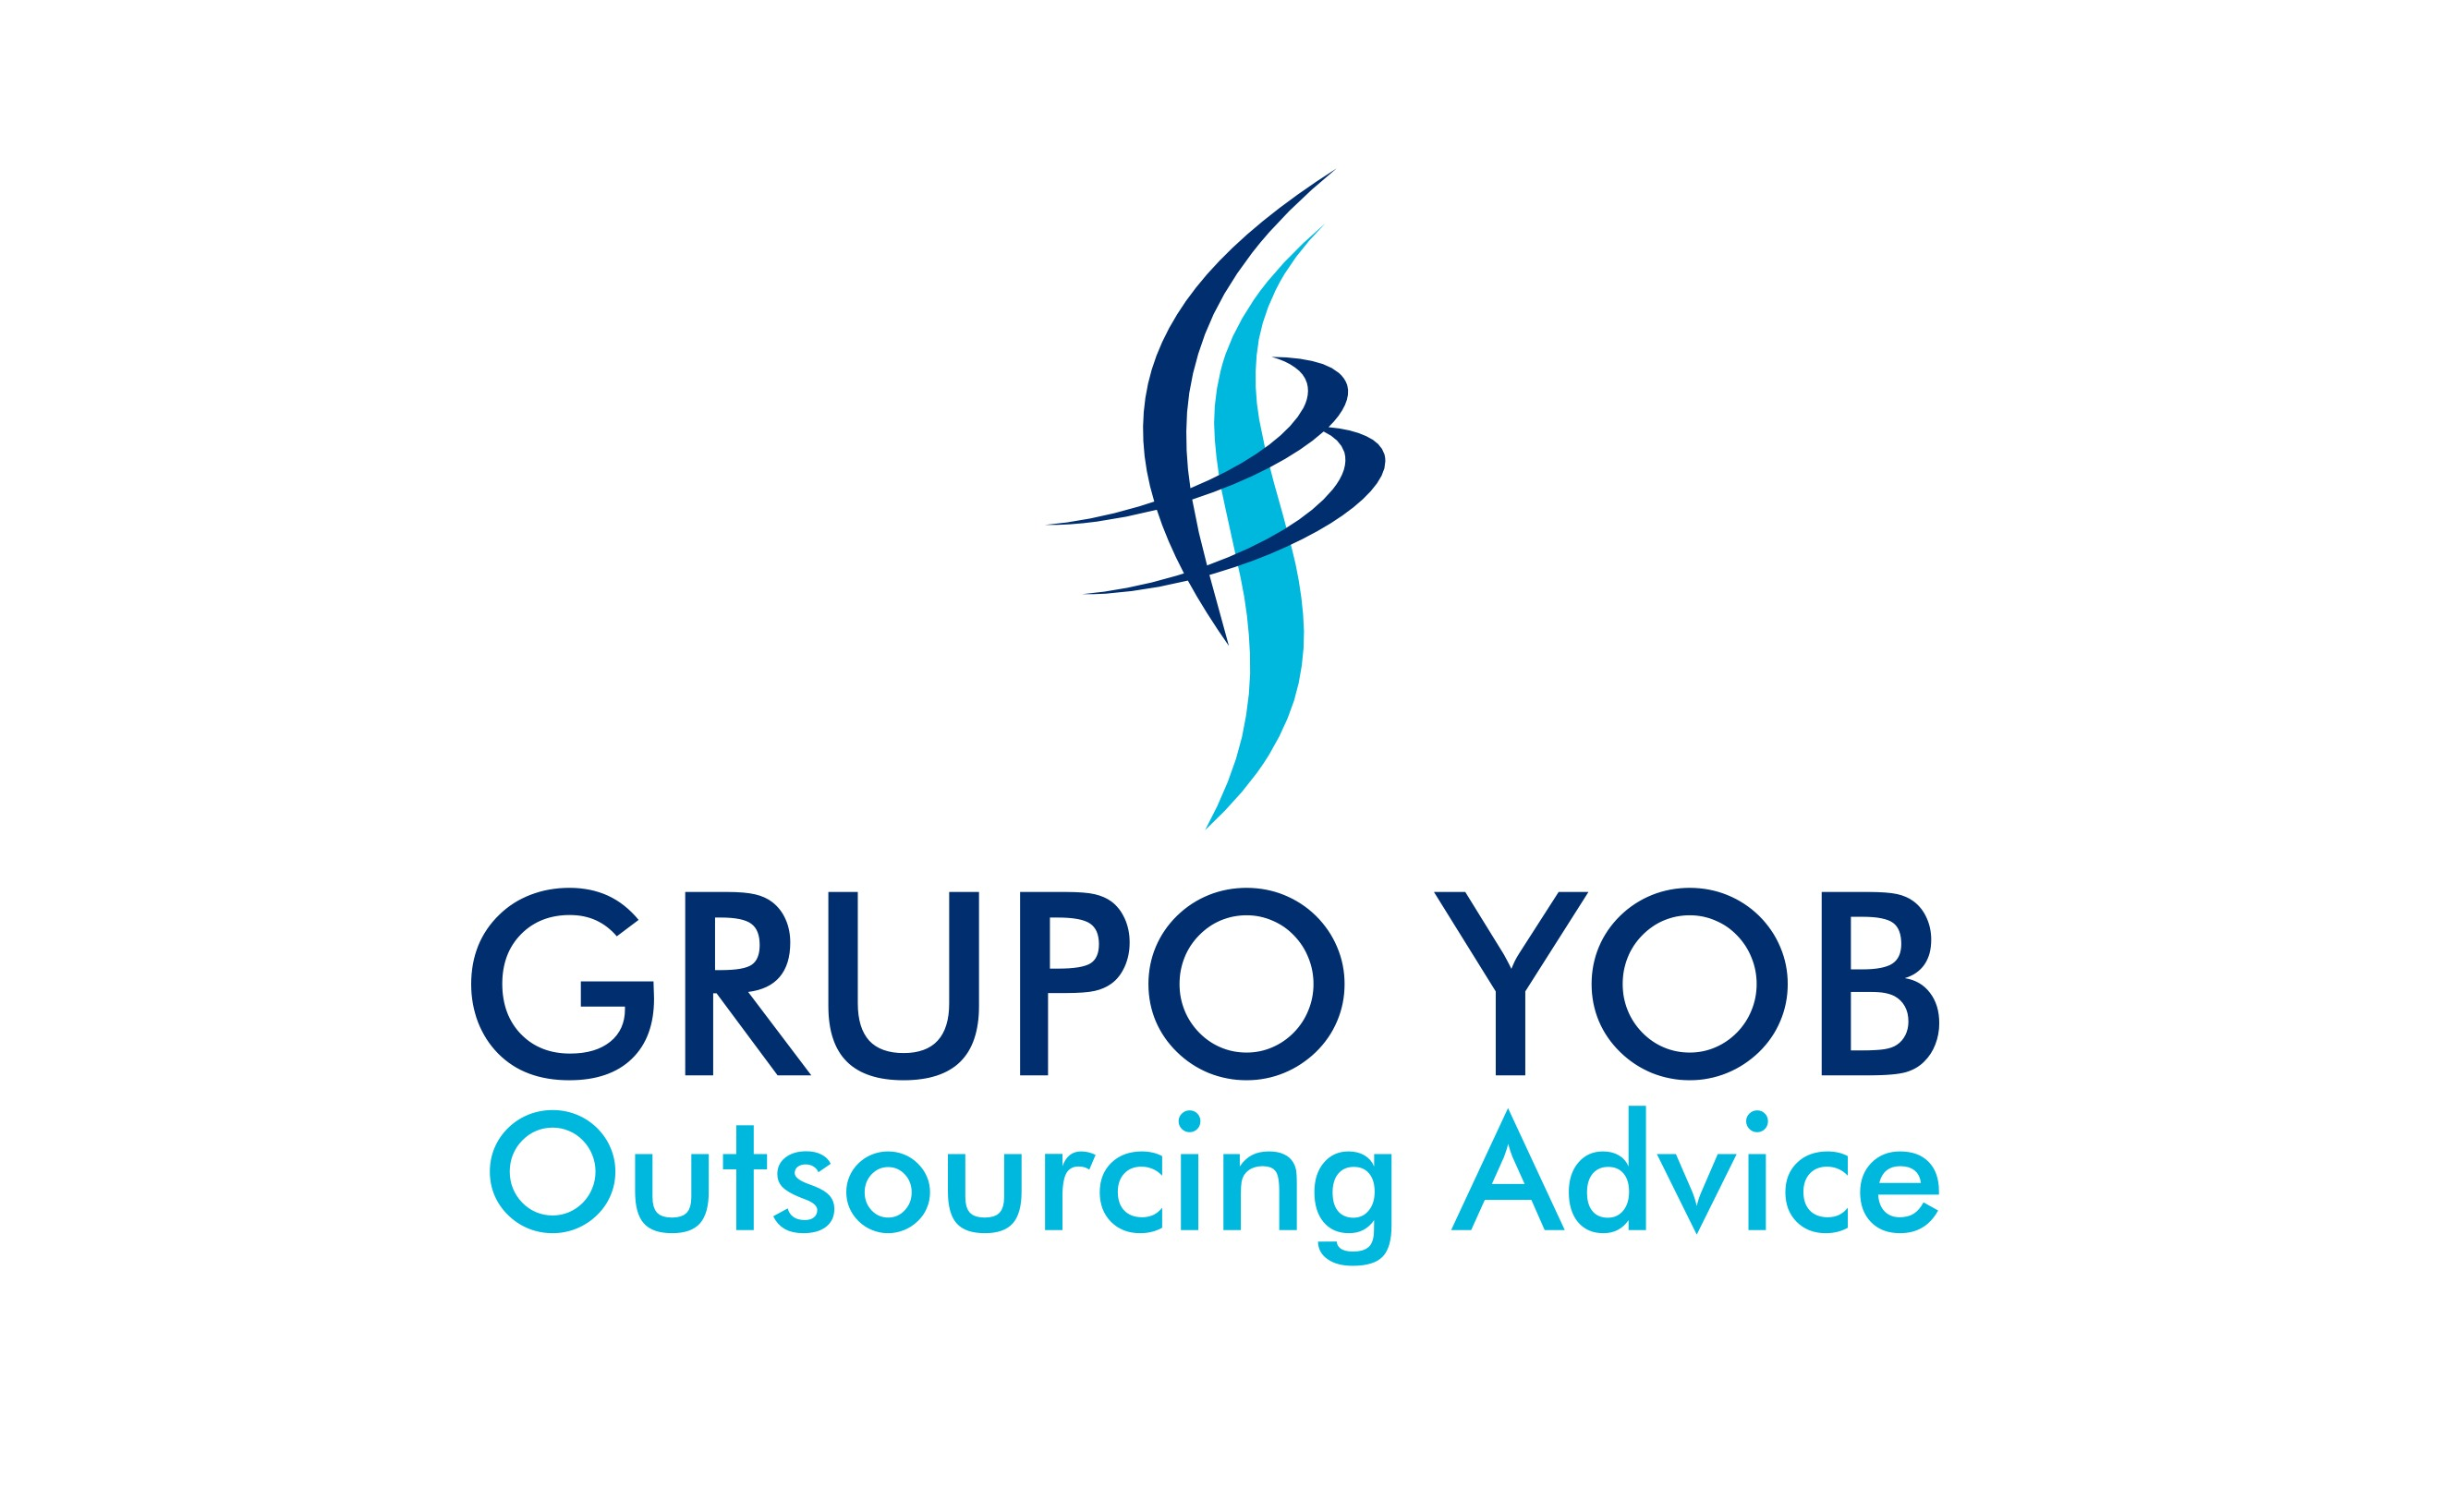 Grupo Yob